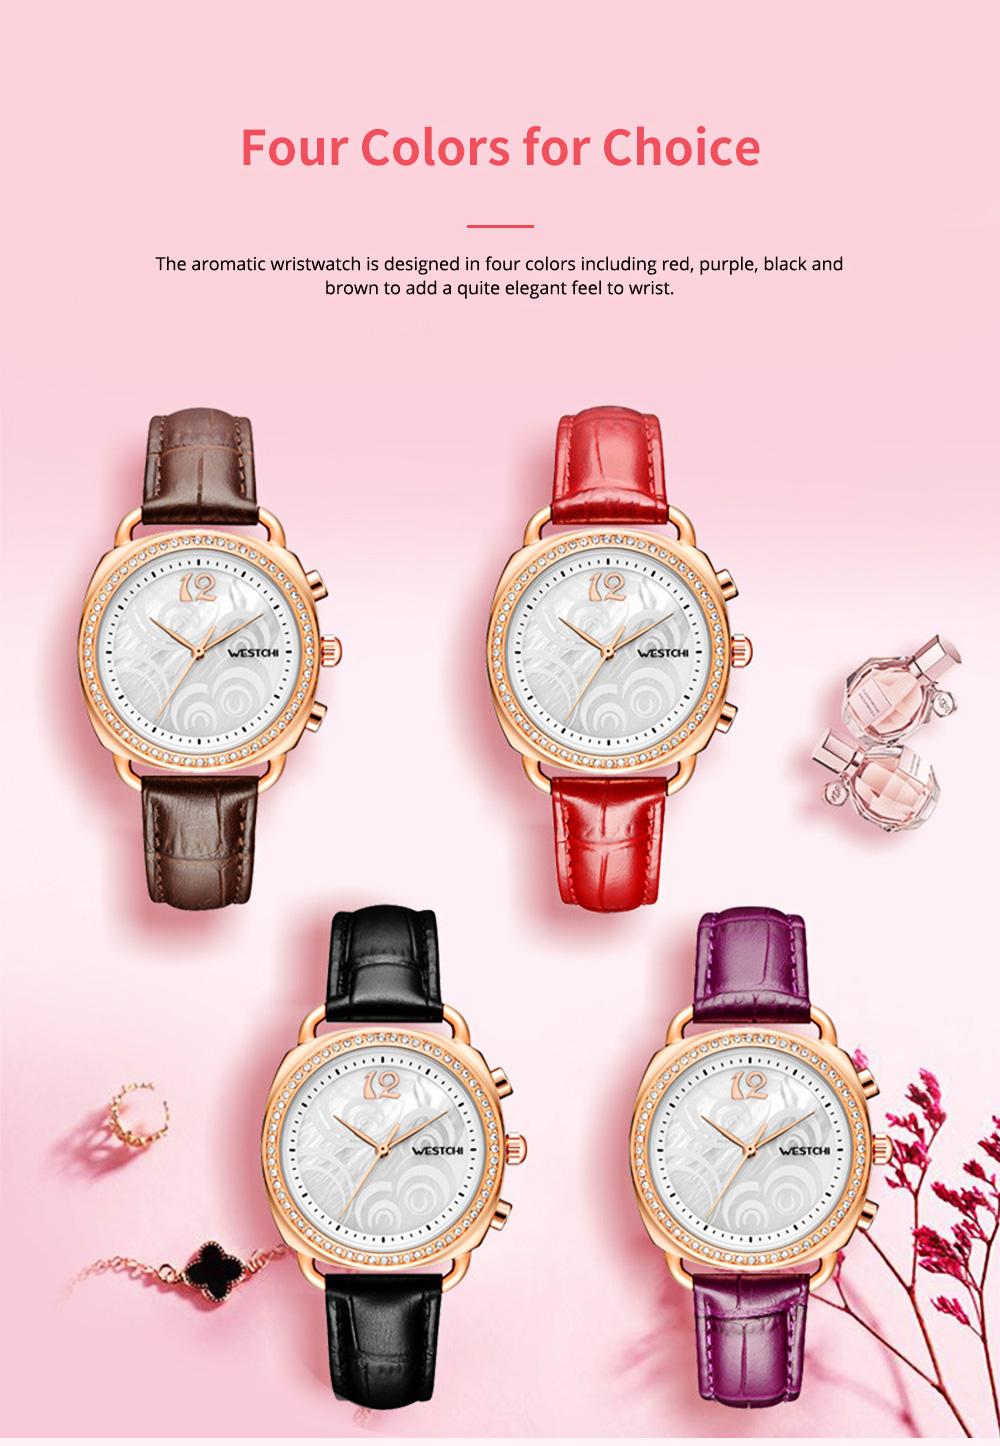 Fashionable Women's Wristwatch with Perfume Smell Screw-in Watch-head Wear Resistant Leather Miyota Quartz Watch 8